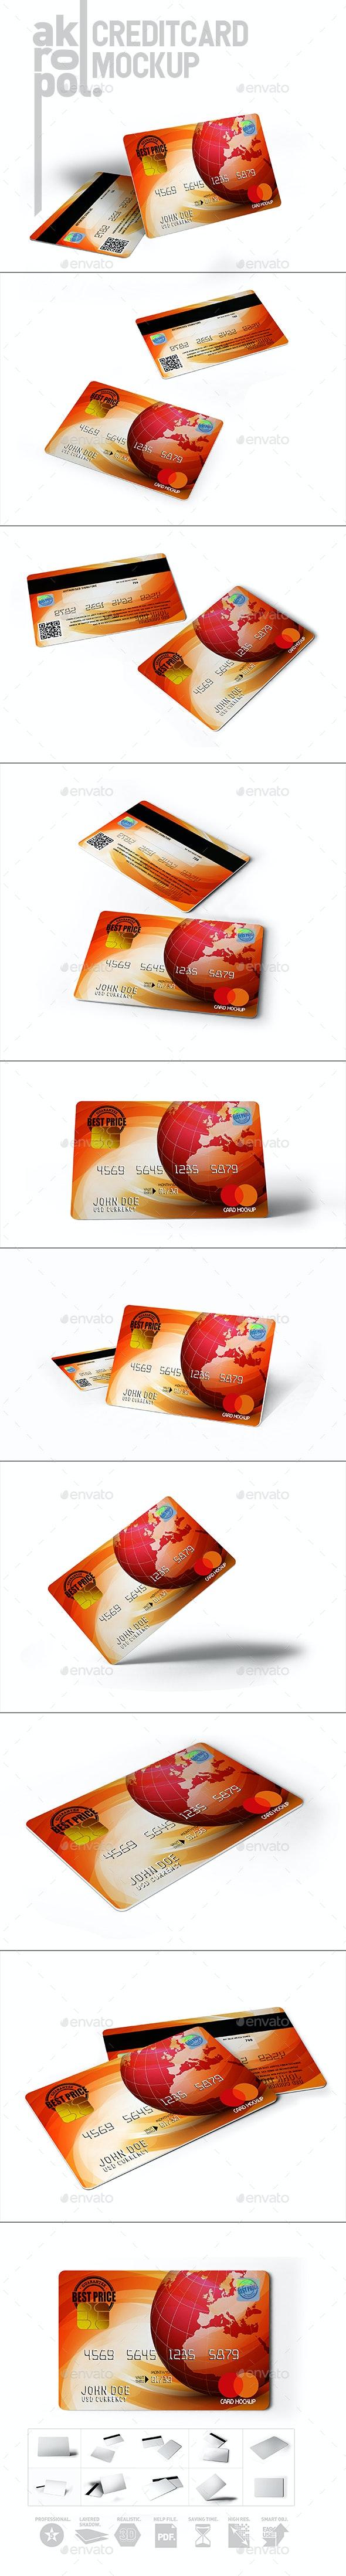 Credit Cards Mockup - Product Mock-Ups Graphics